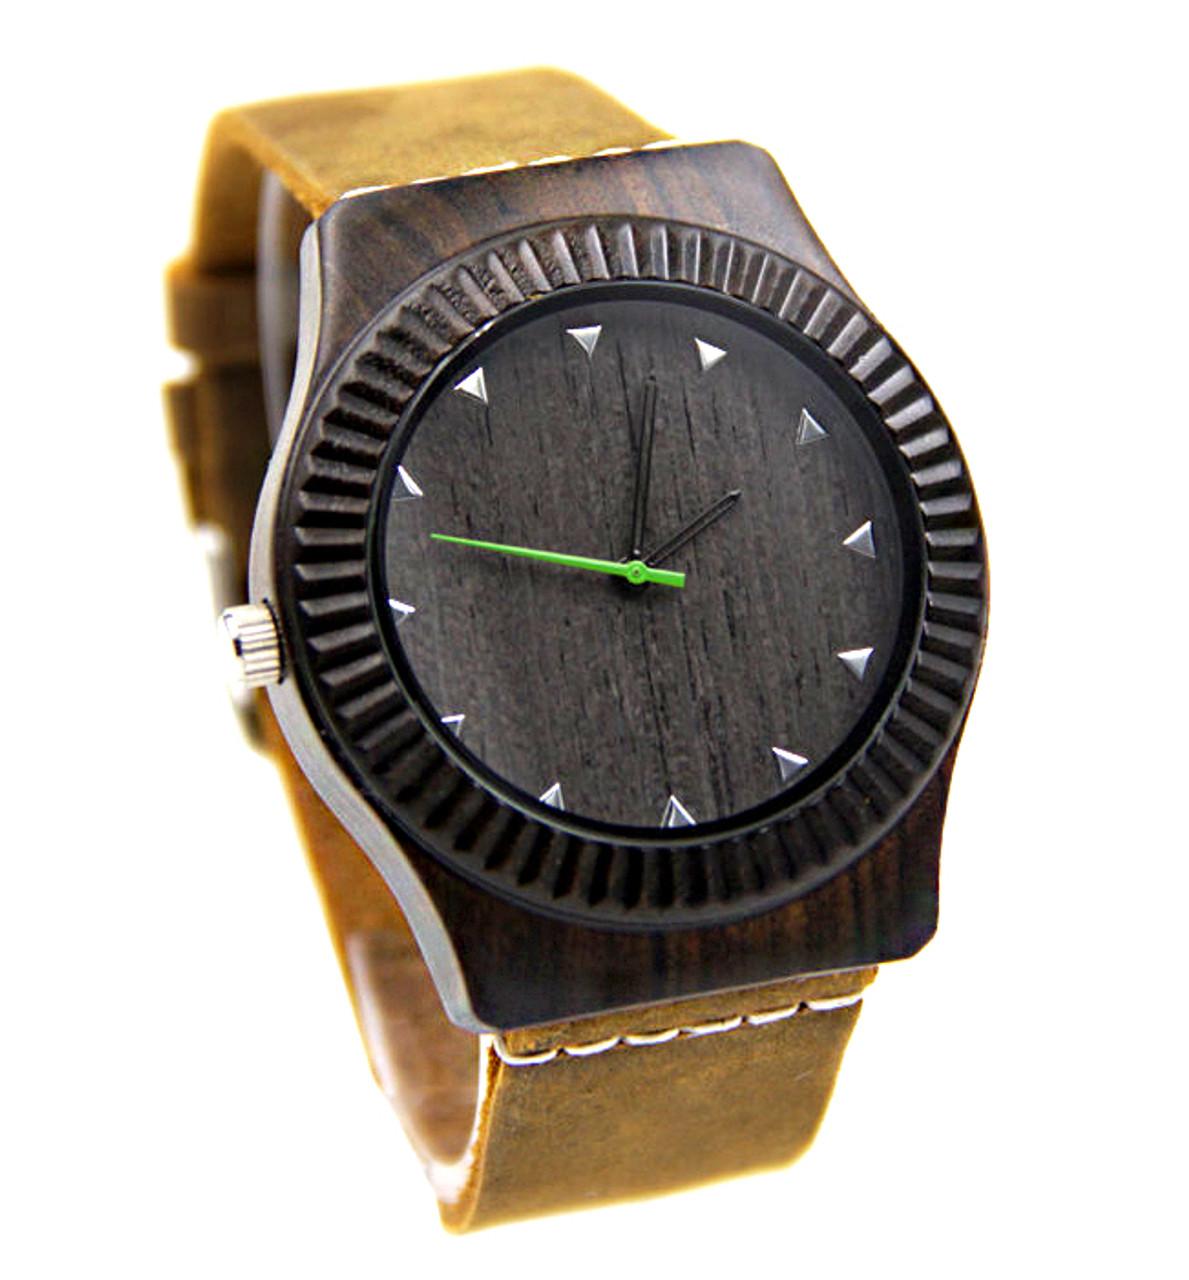 Grpn - Wood Engraved Watch W#87 - Vault